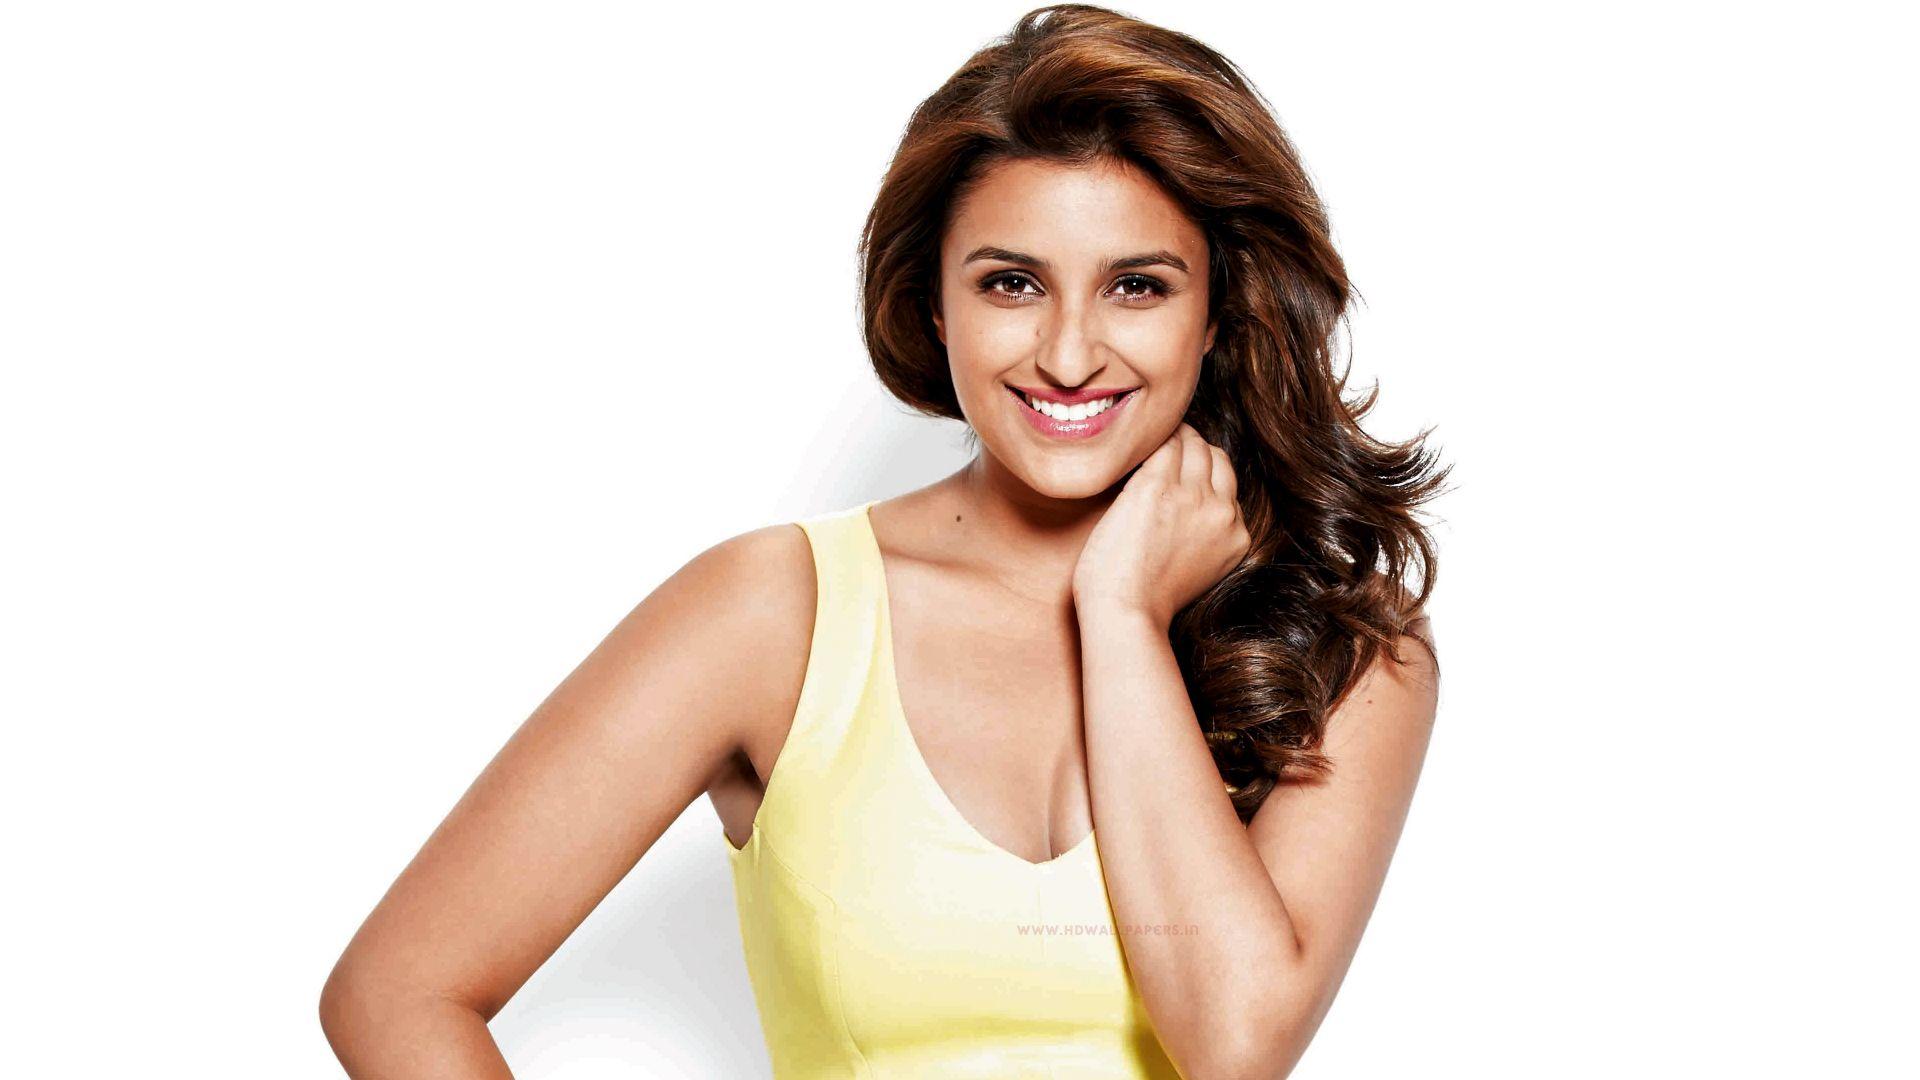 Indian celebrity hot image